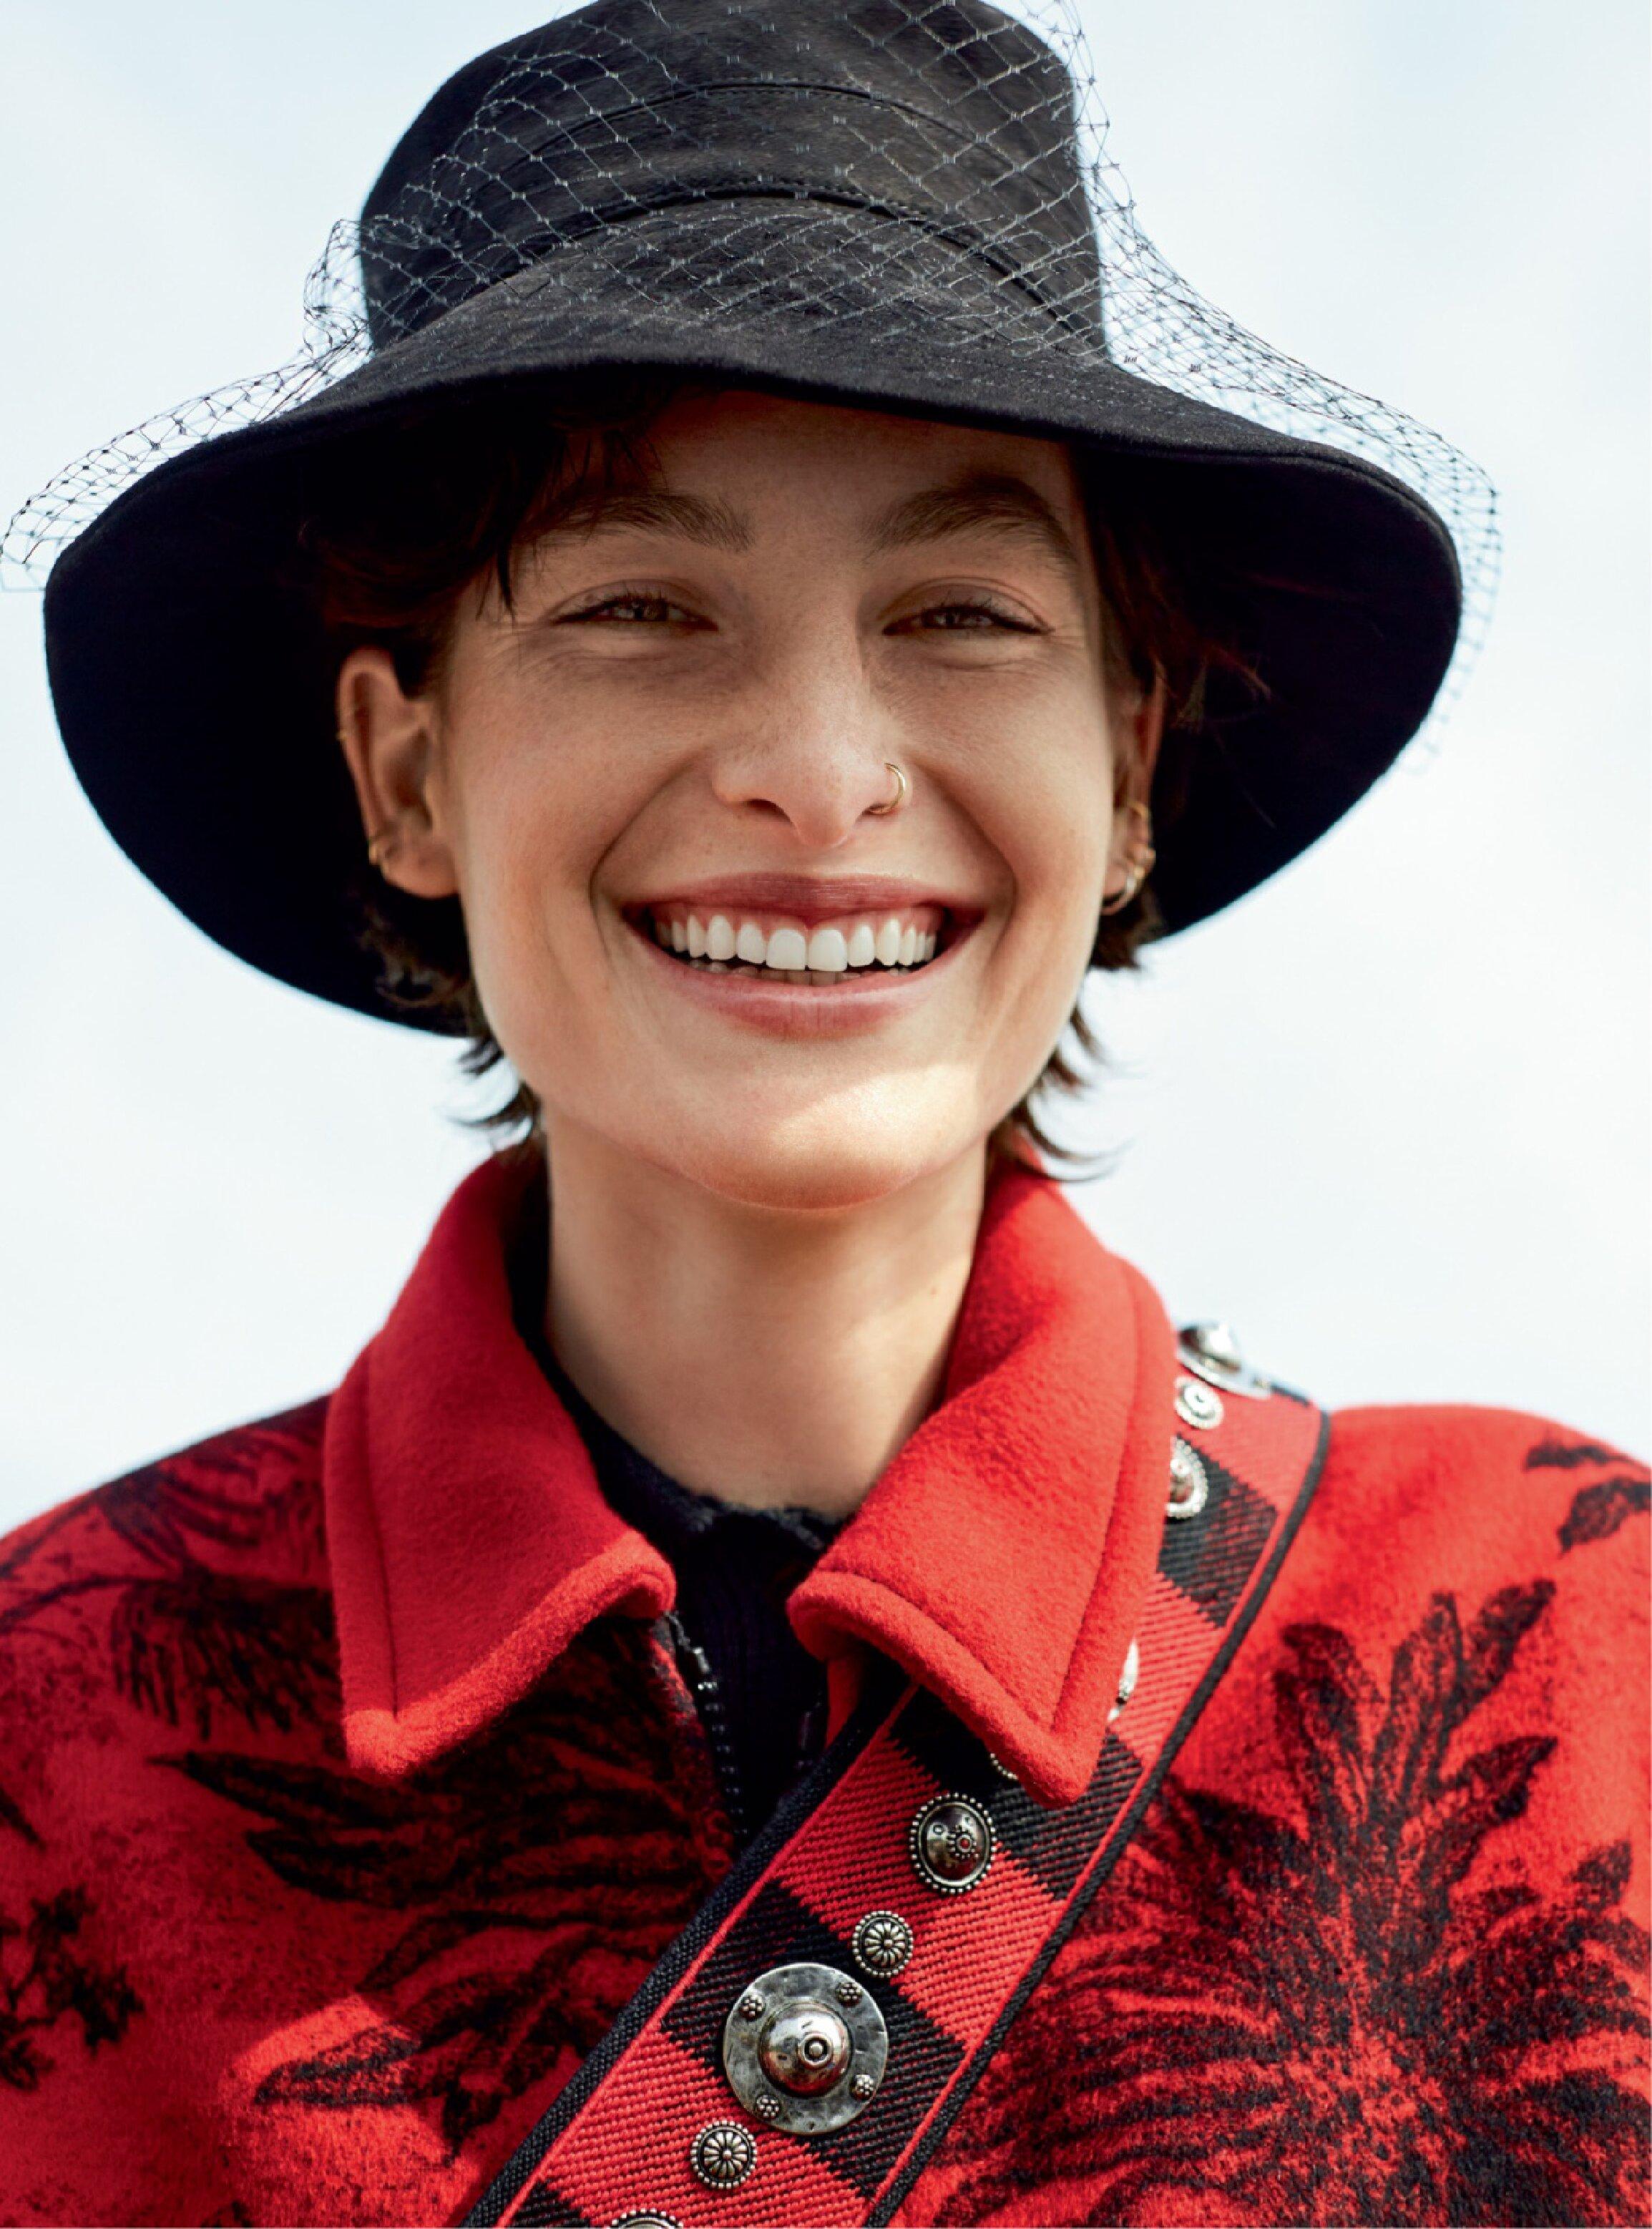 Agata Popieszynska-Girls Are Back in Town Harper's Bazaar UK Aug 2019 (32).jpg